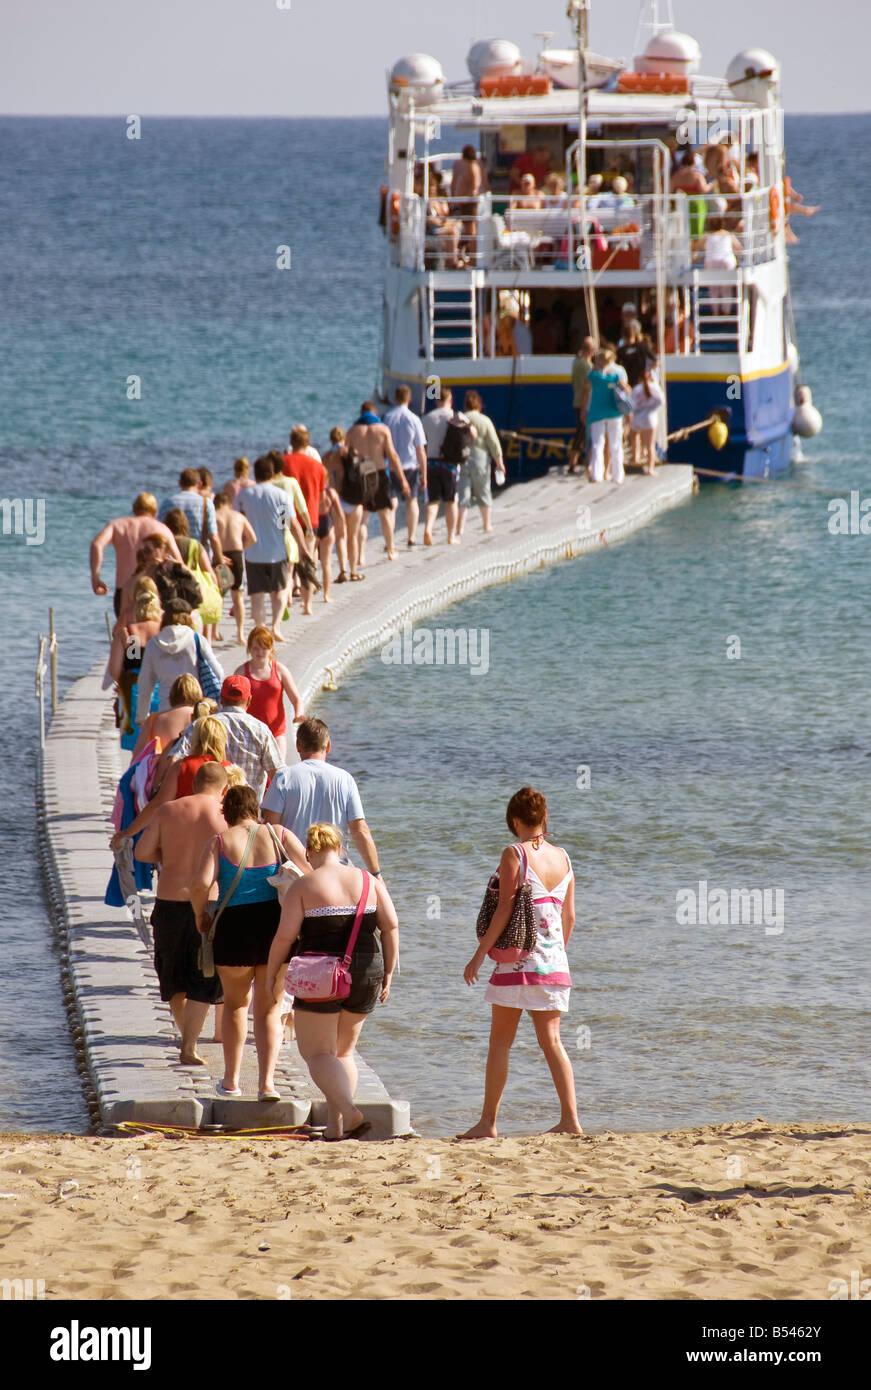 Boarding the ferry at Agios Nickolas, Zante, Ionian Islands Greece. - Stock Image